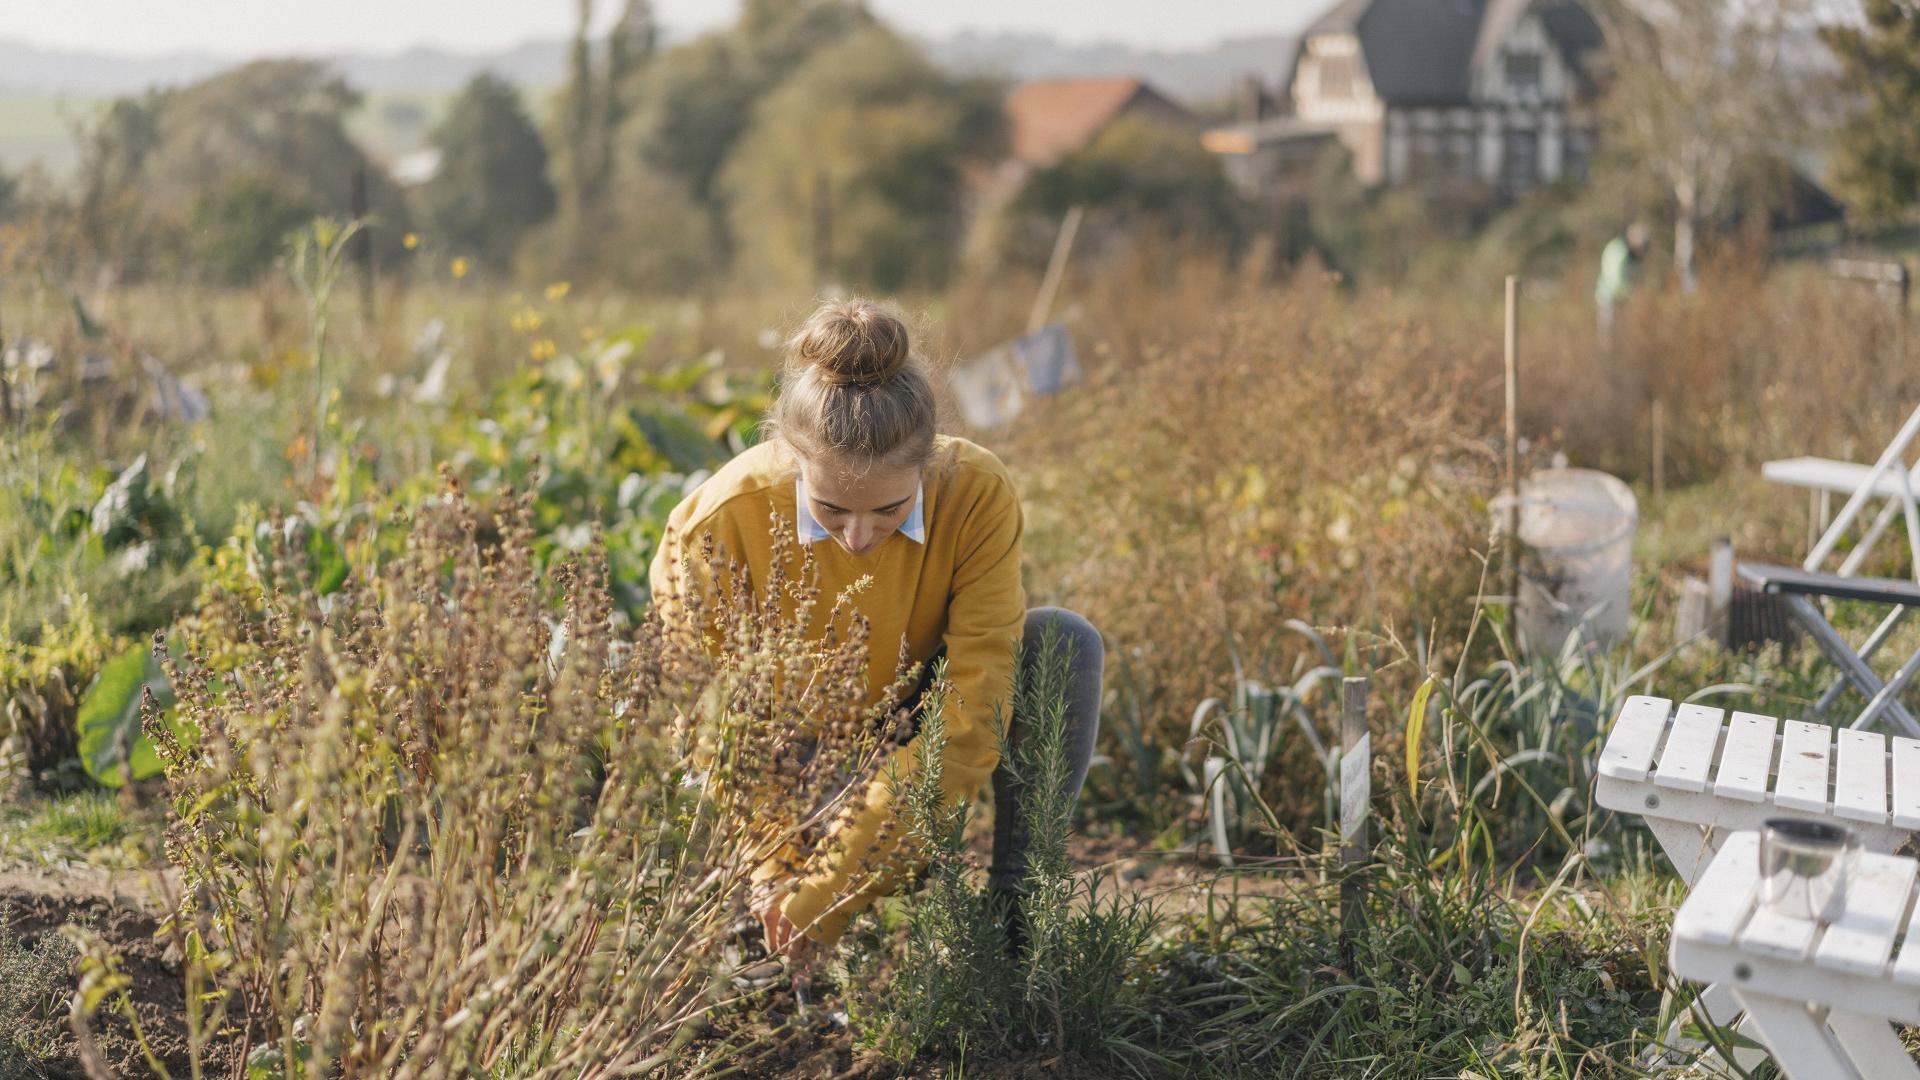 Garten Arbeit Frau Natur